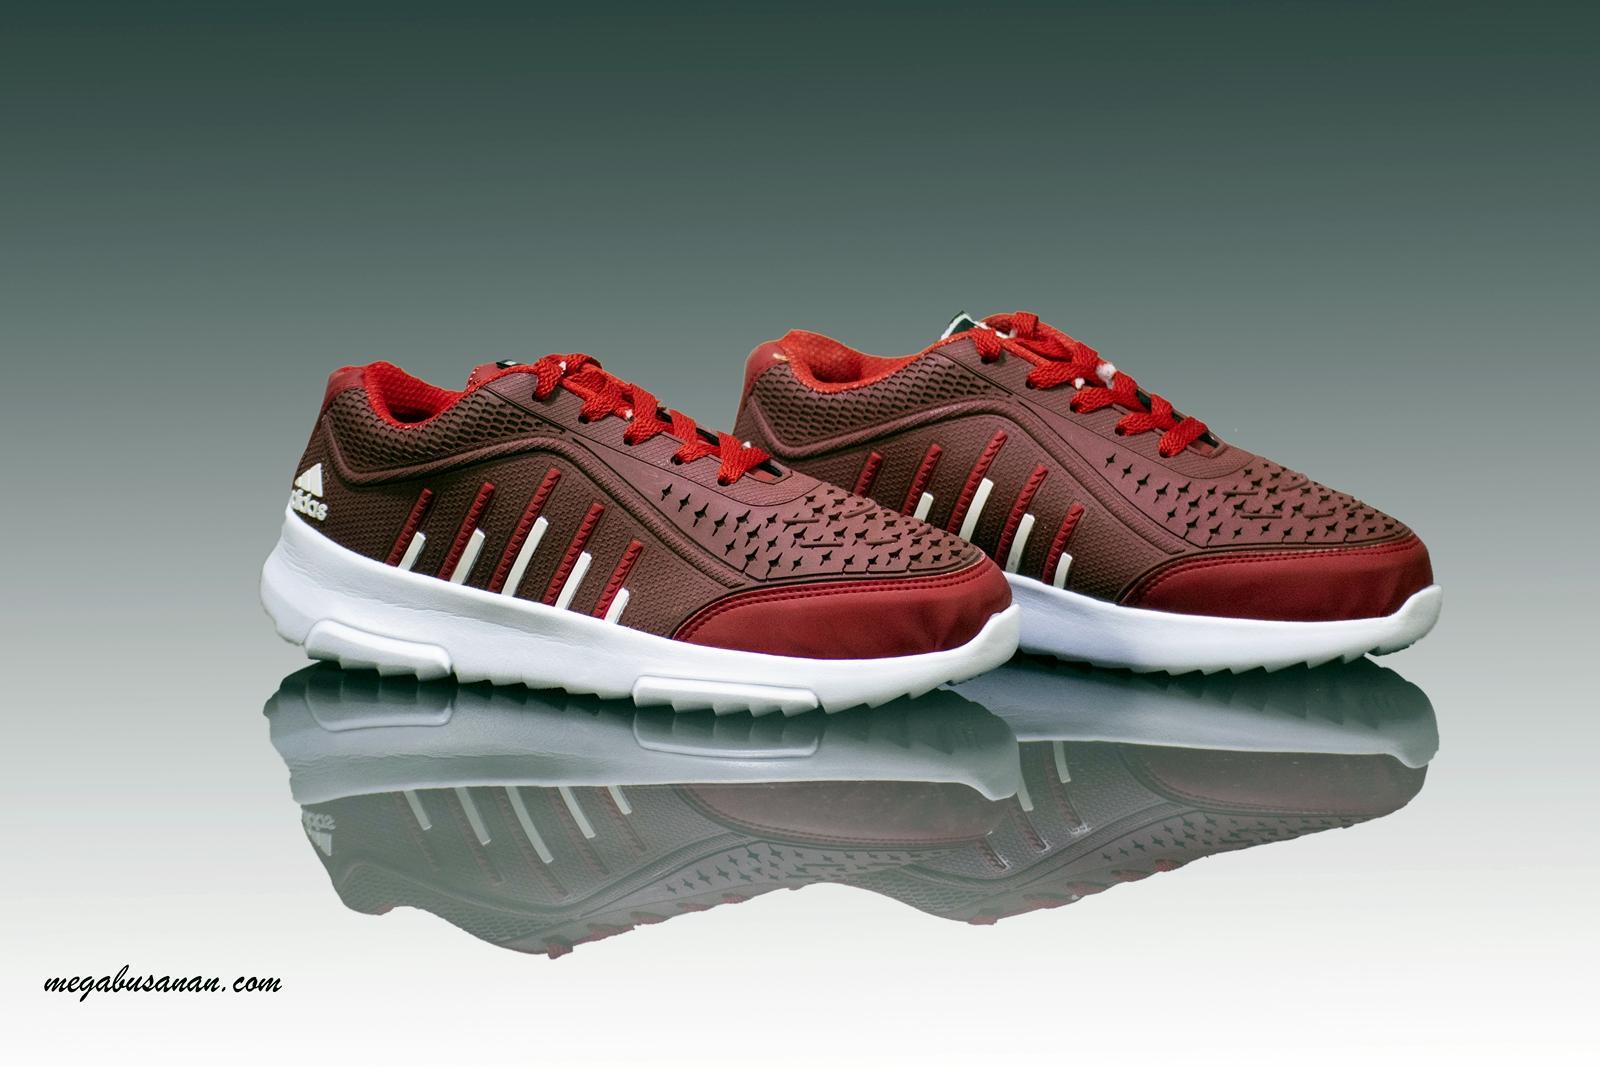 Harga Sepatu Sport Adidas 2018 Termurah Maret 2019  923dee87fd